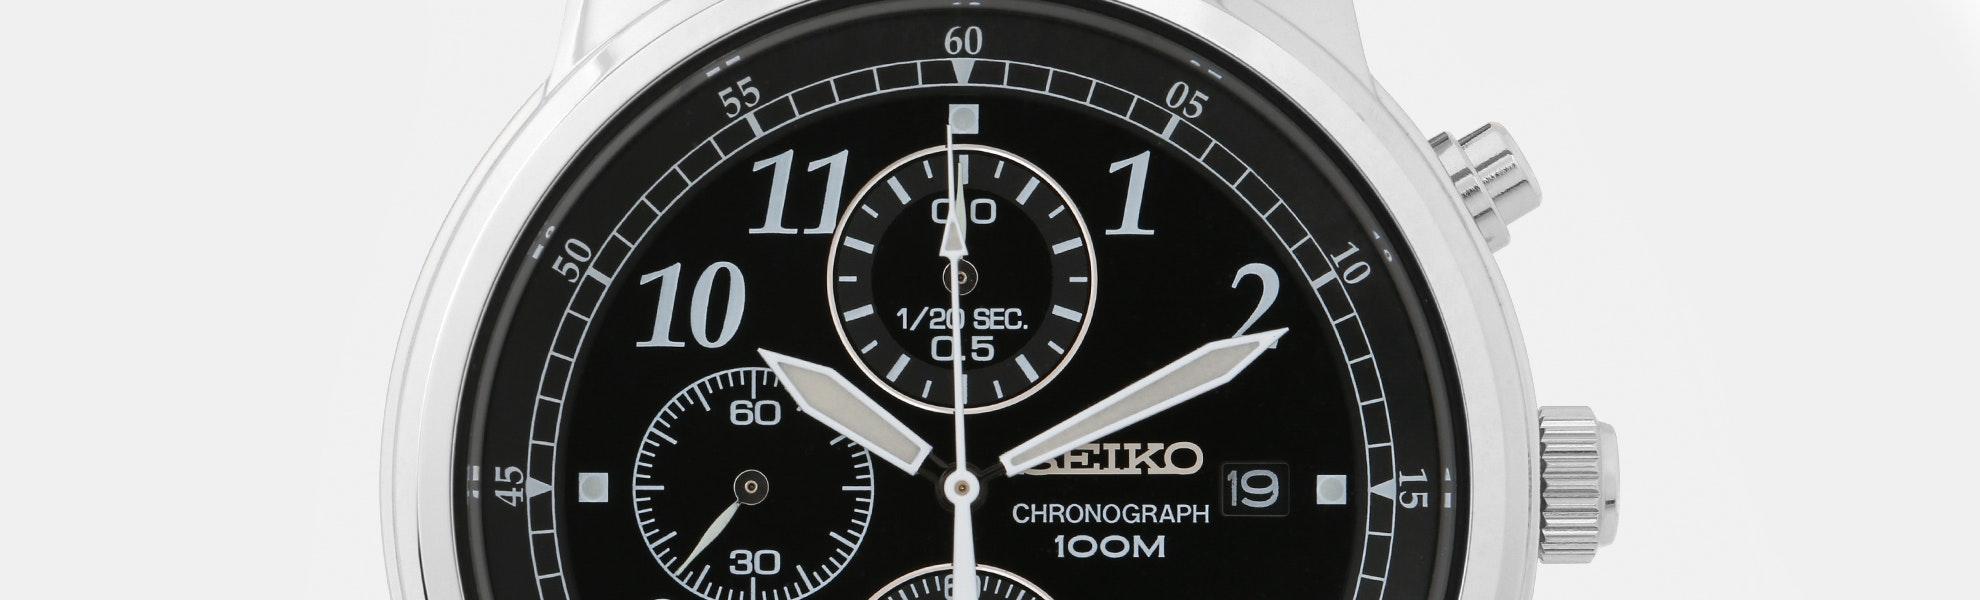 Seiko Classic Chronograph Watch